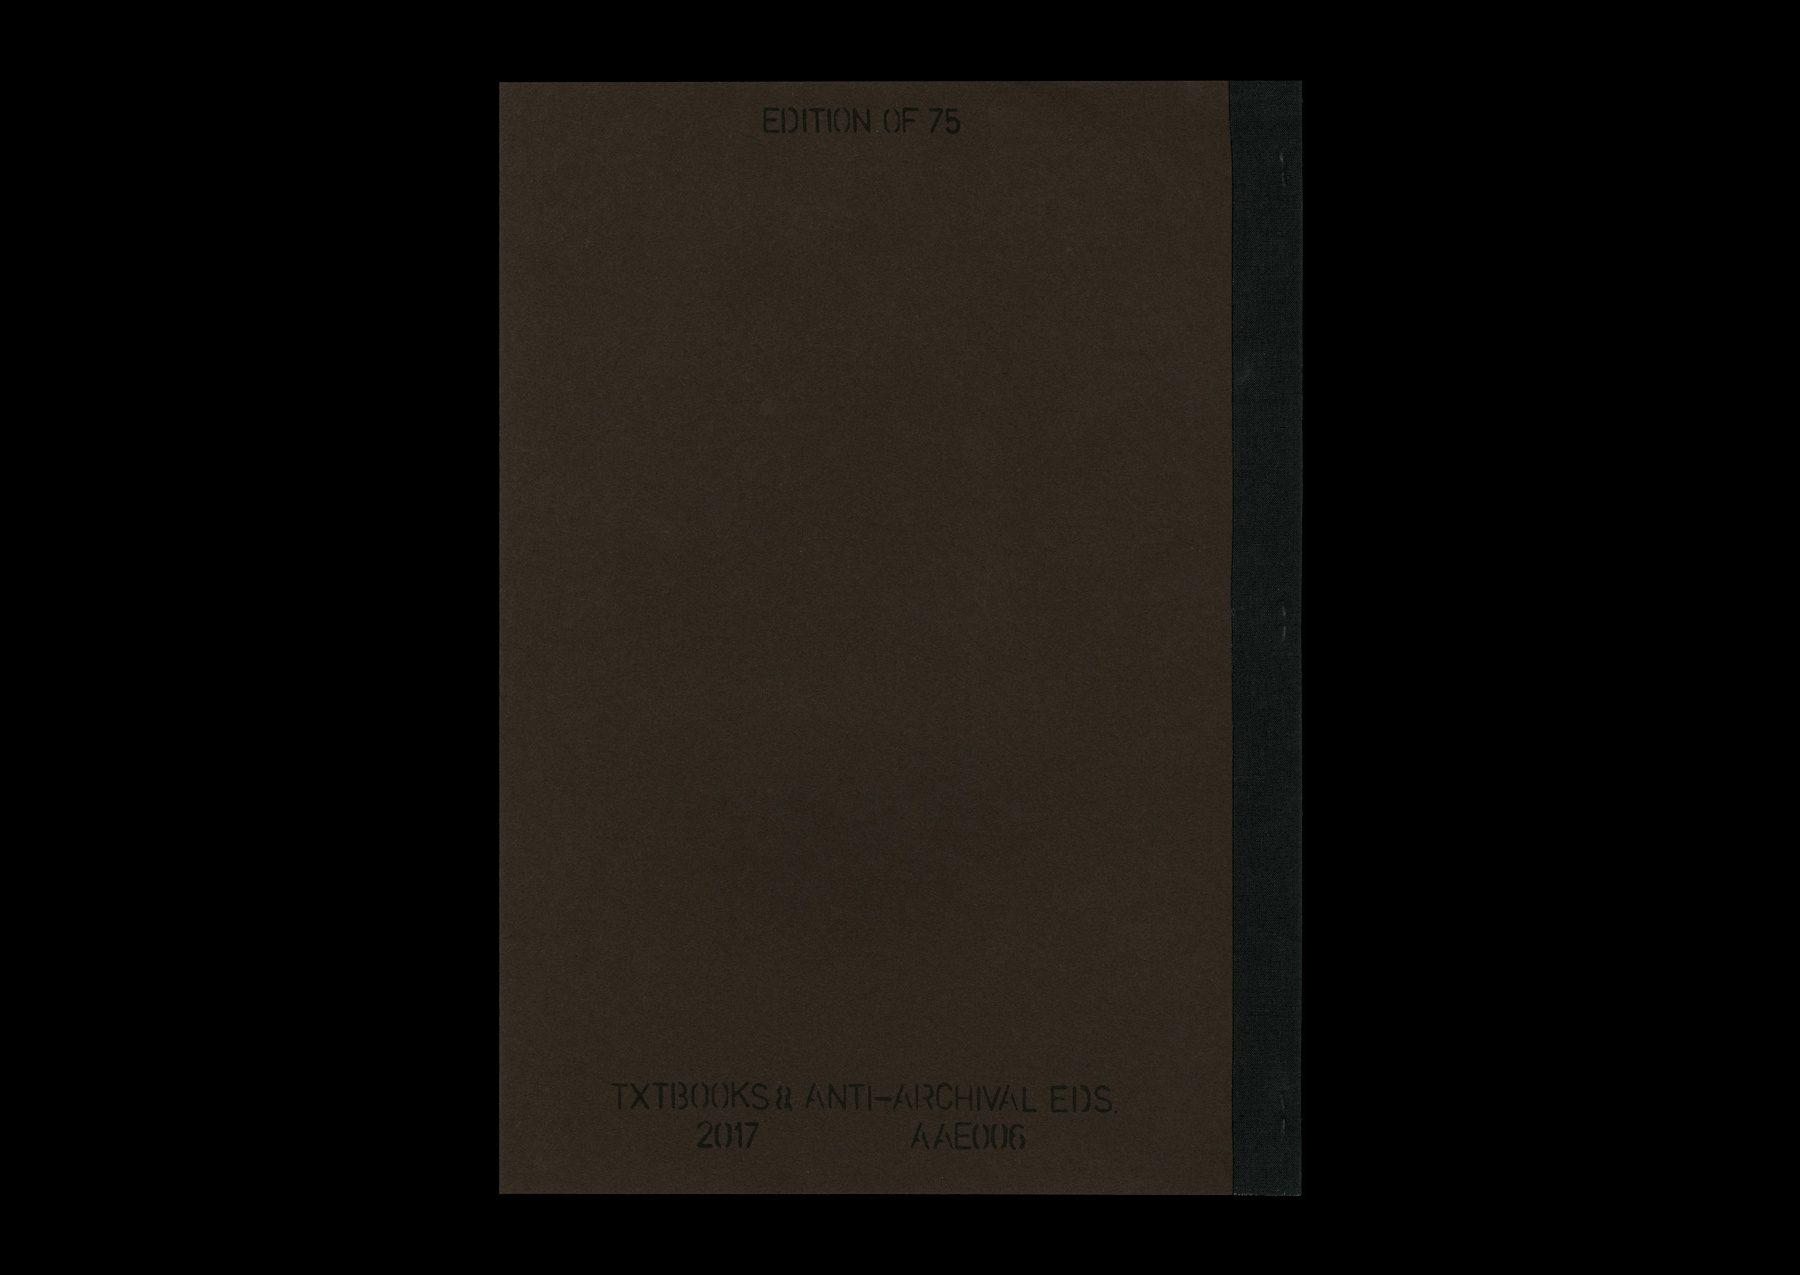 libri scontati su amazon how many types of vinca